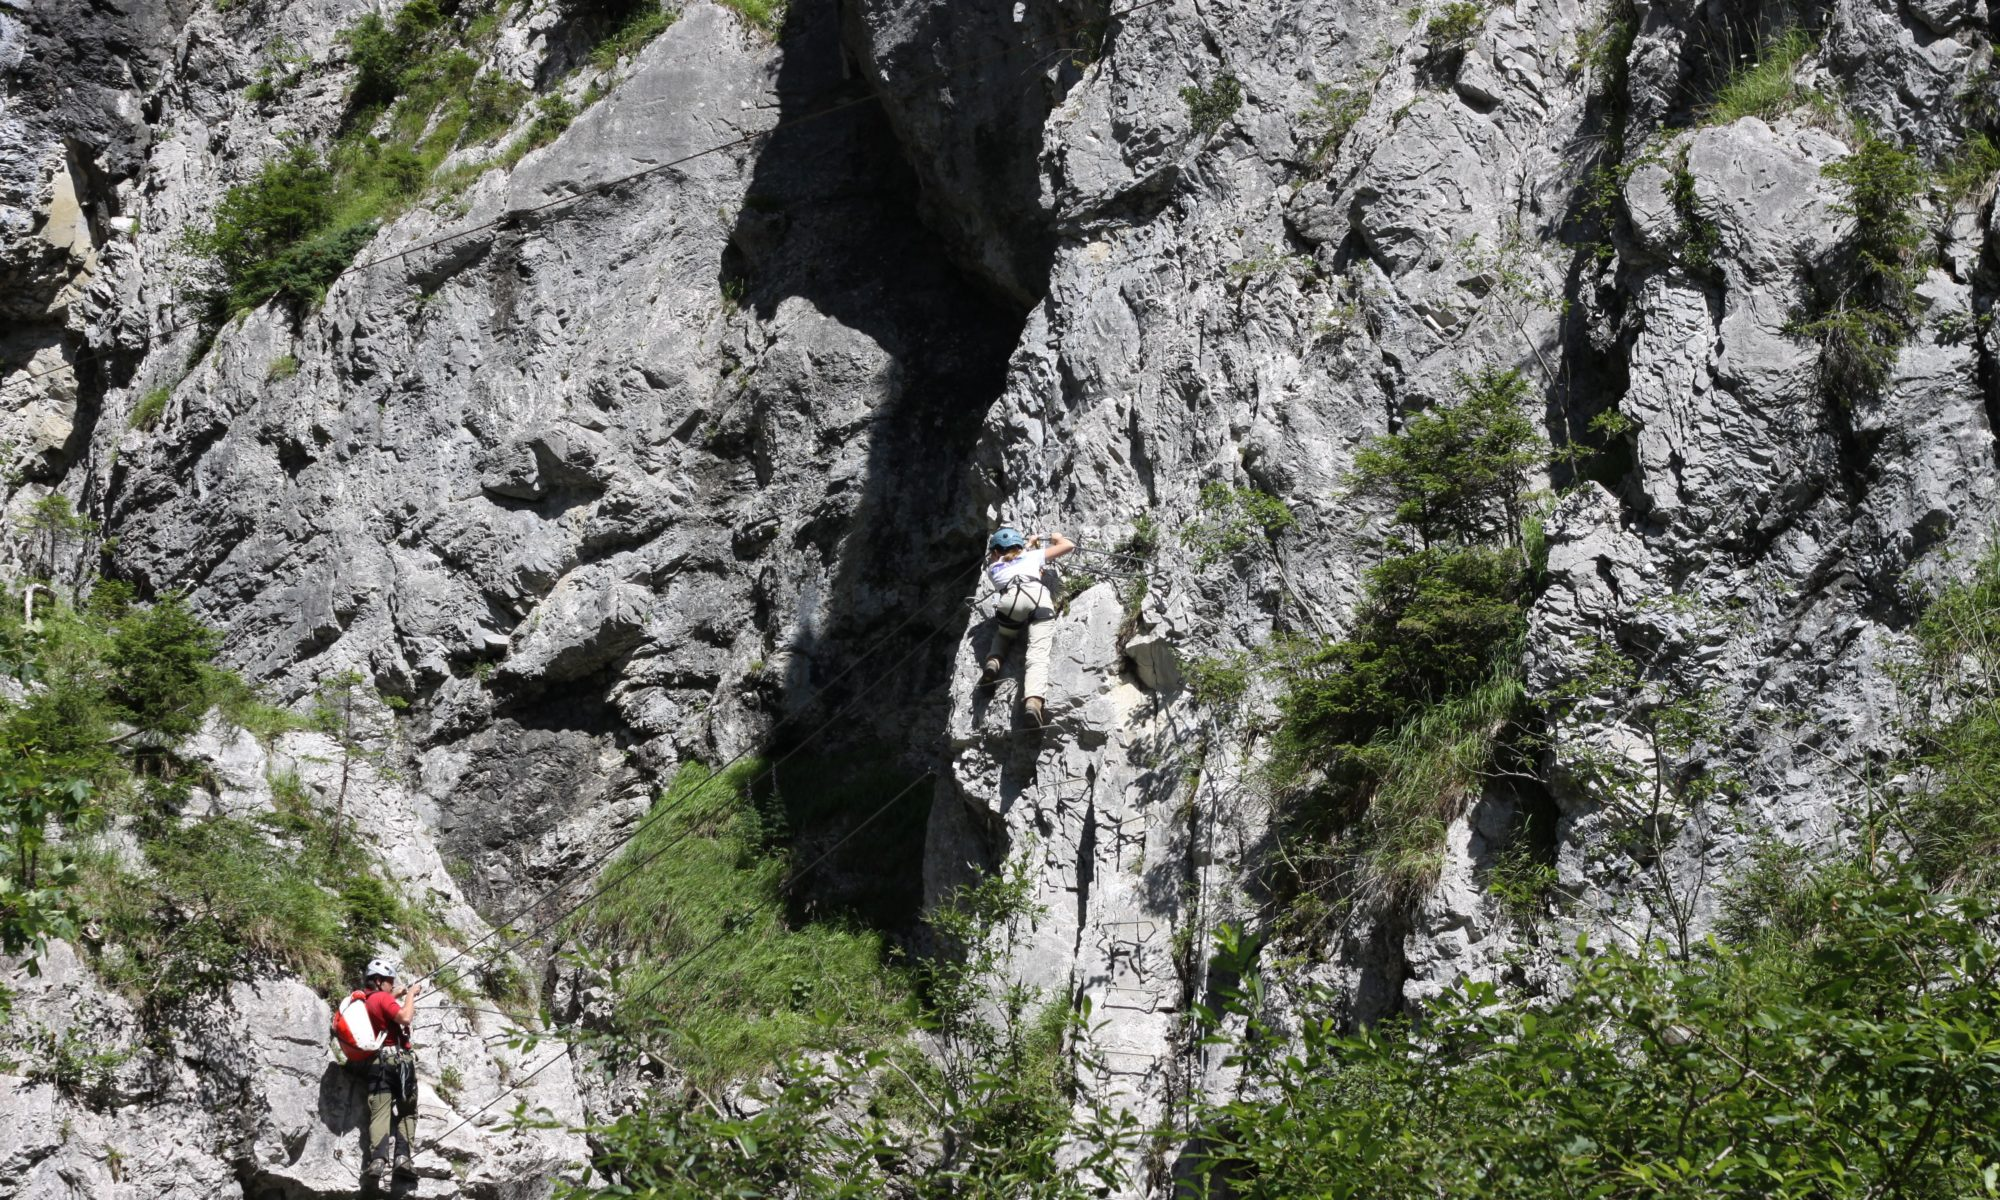 Klettersteig Andermatt : Klettersteig u2013 being outdoor.de